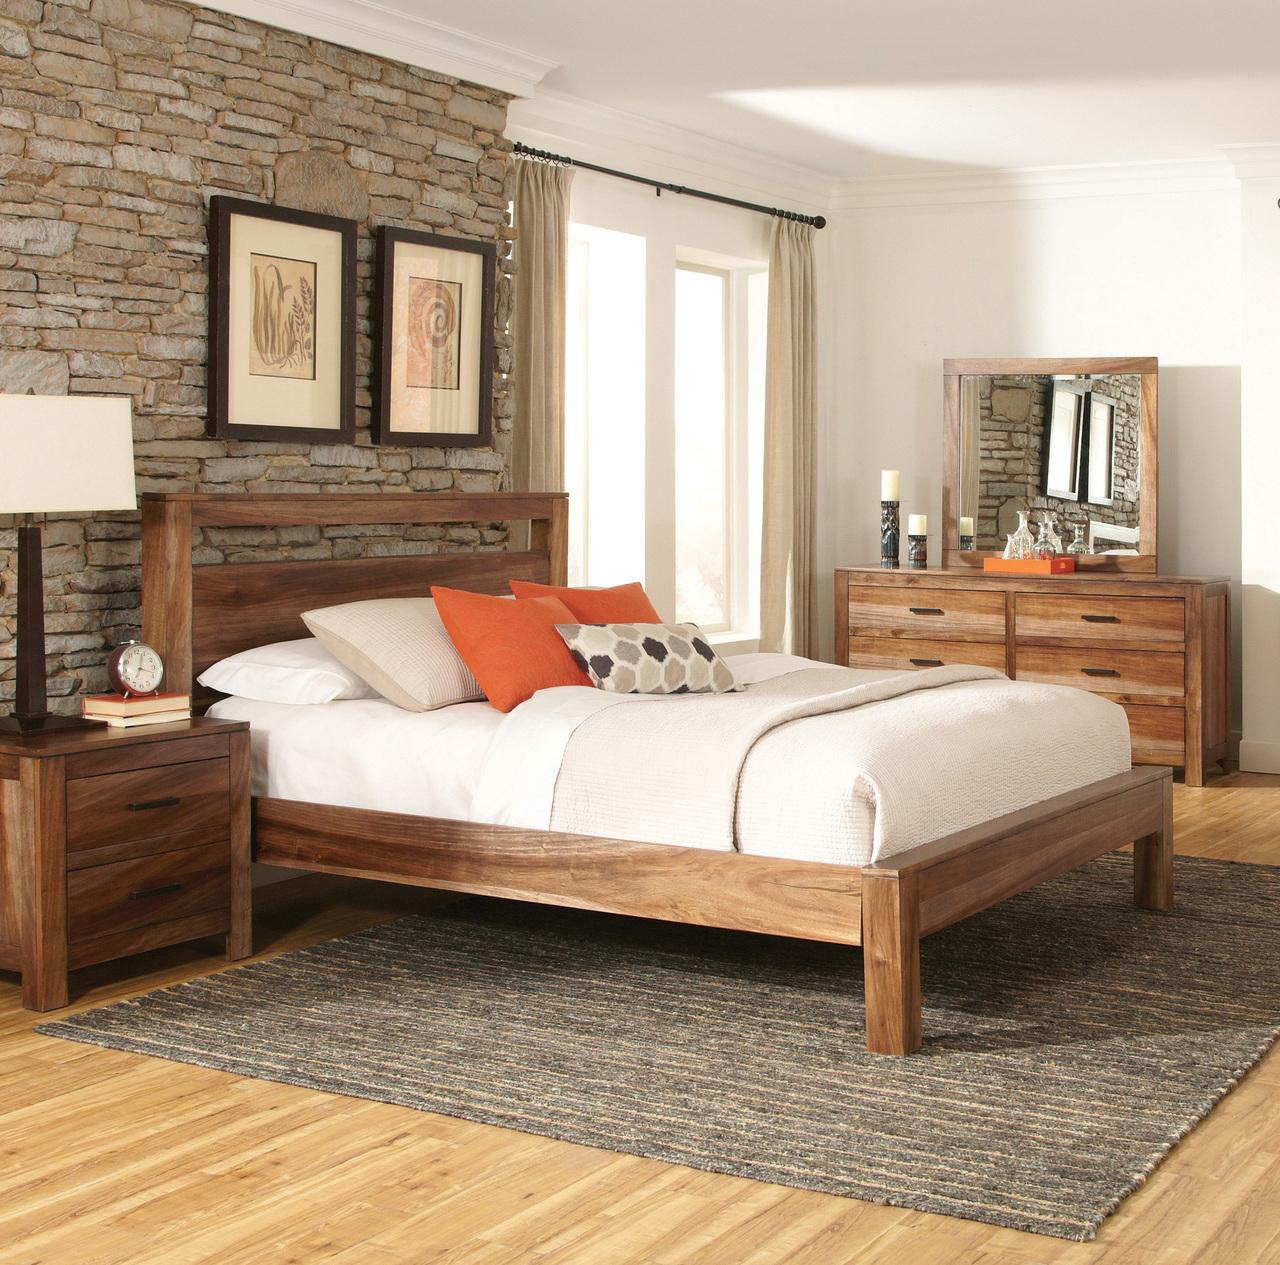 Platform Bedroom Sets Bedroom Colours As Per Vastu Bedroom Decorating Ideas Plum Bedroom Lighting Next: 10 Great Platform Beds For Any Bedroom Style